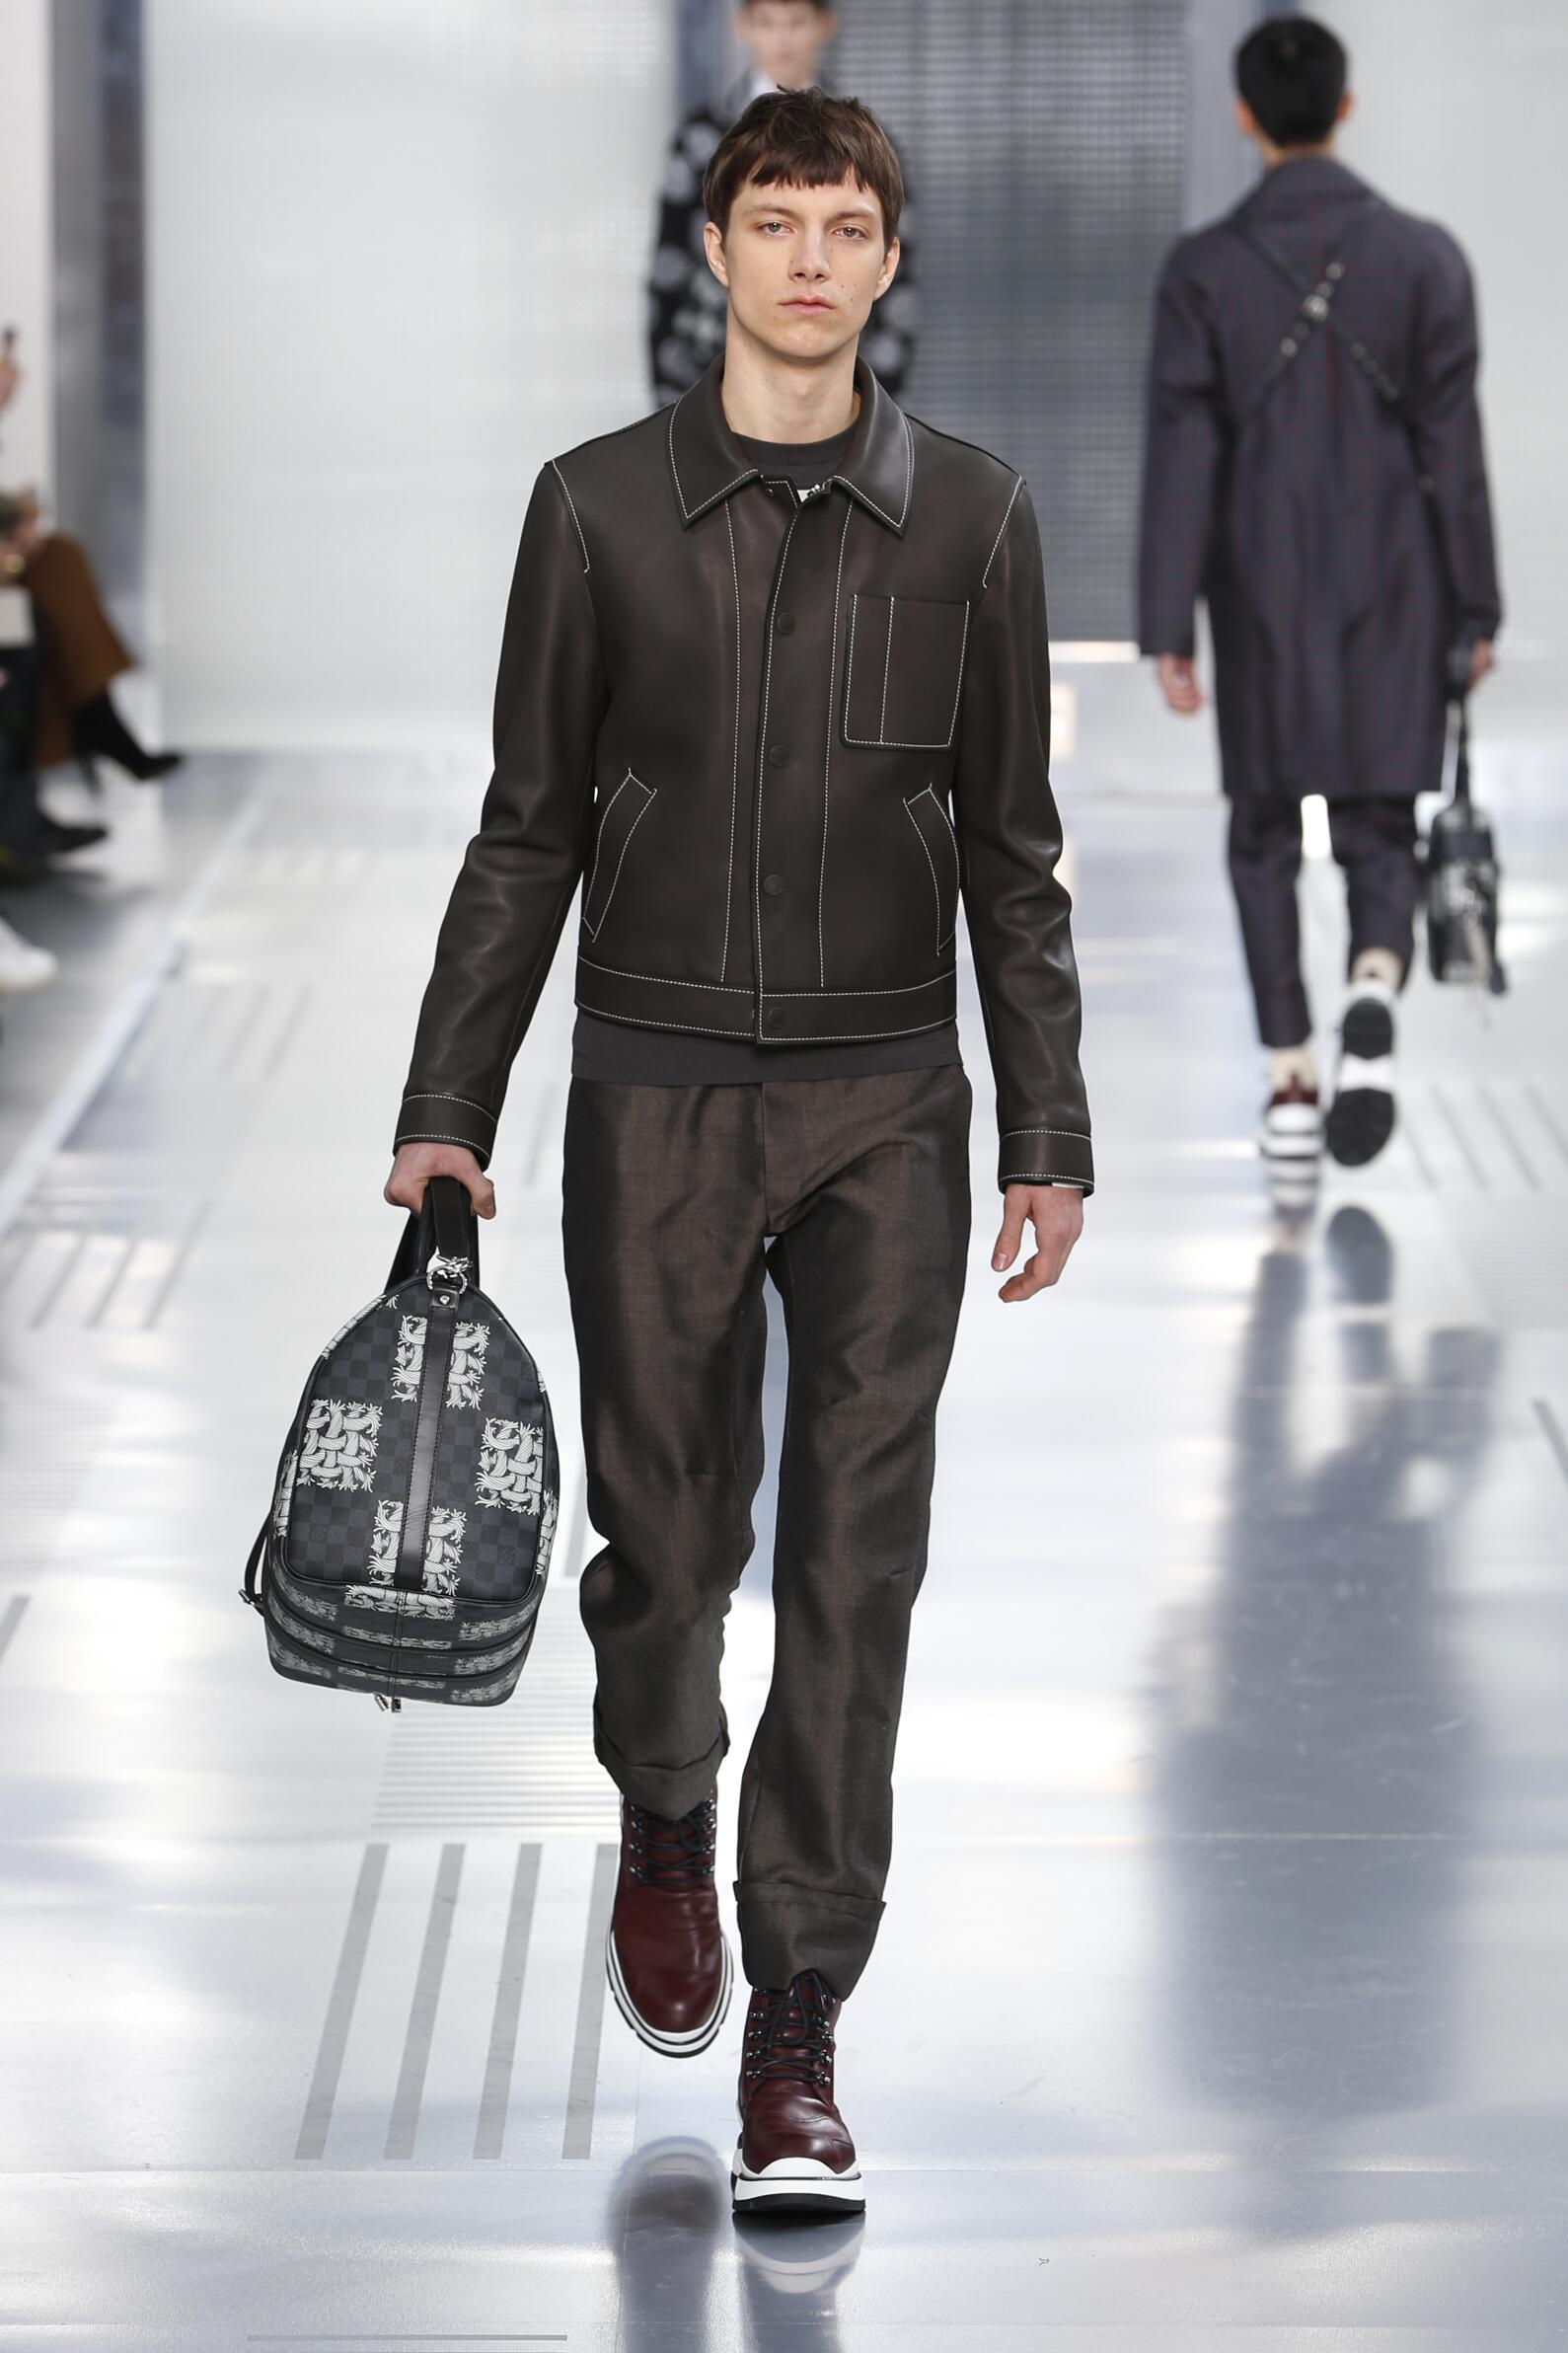 Catwalk Louis Vuitton Menswear Collection Winter 2015